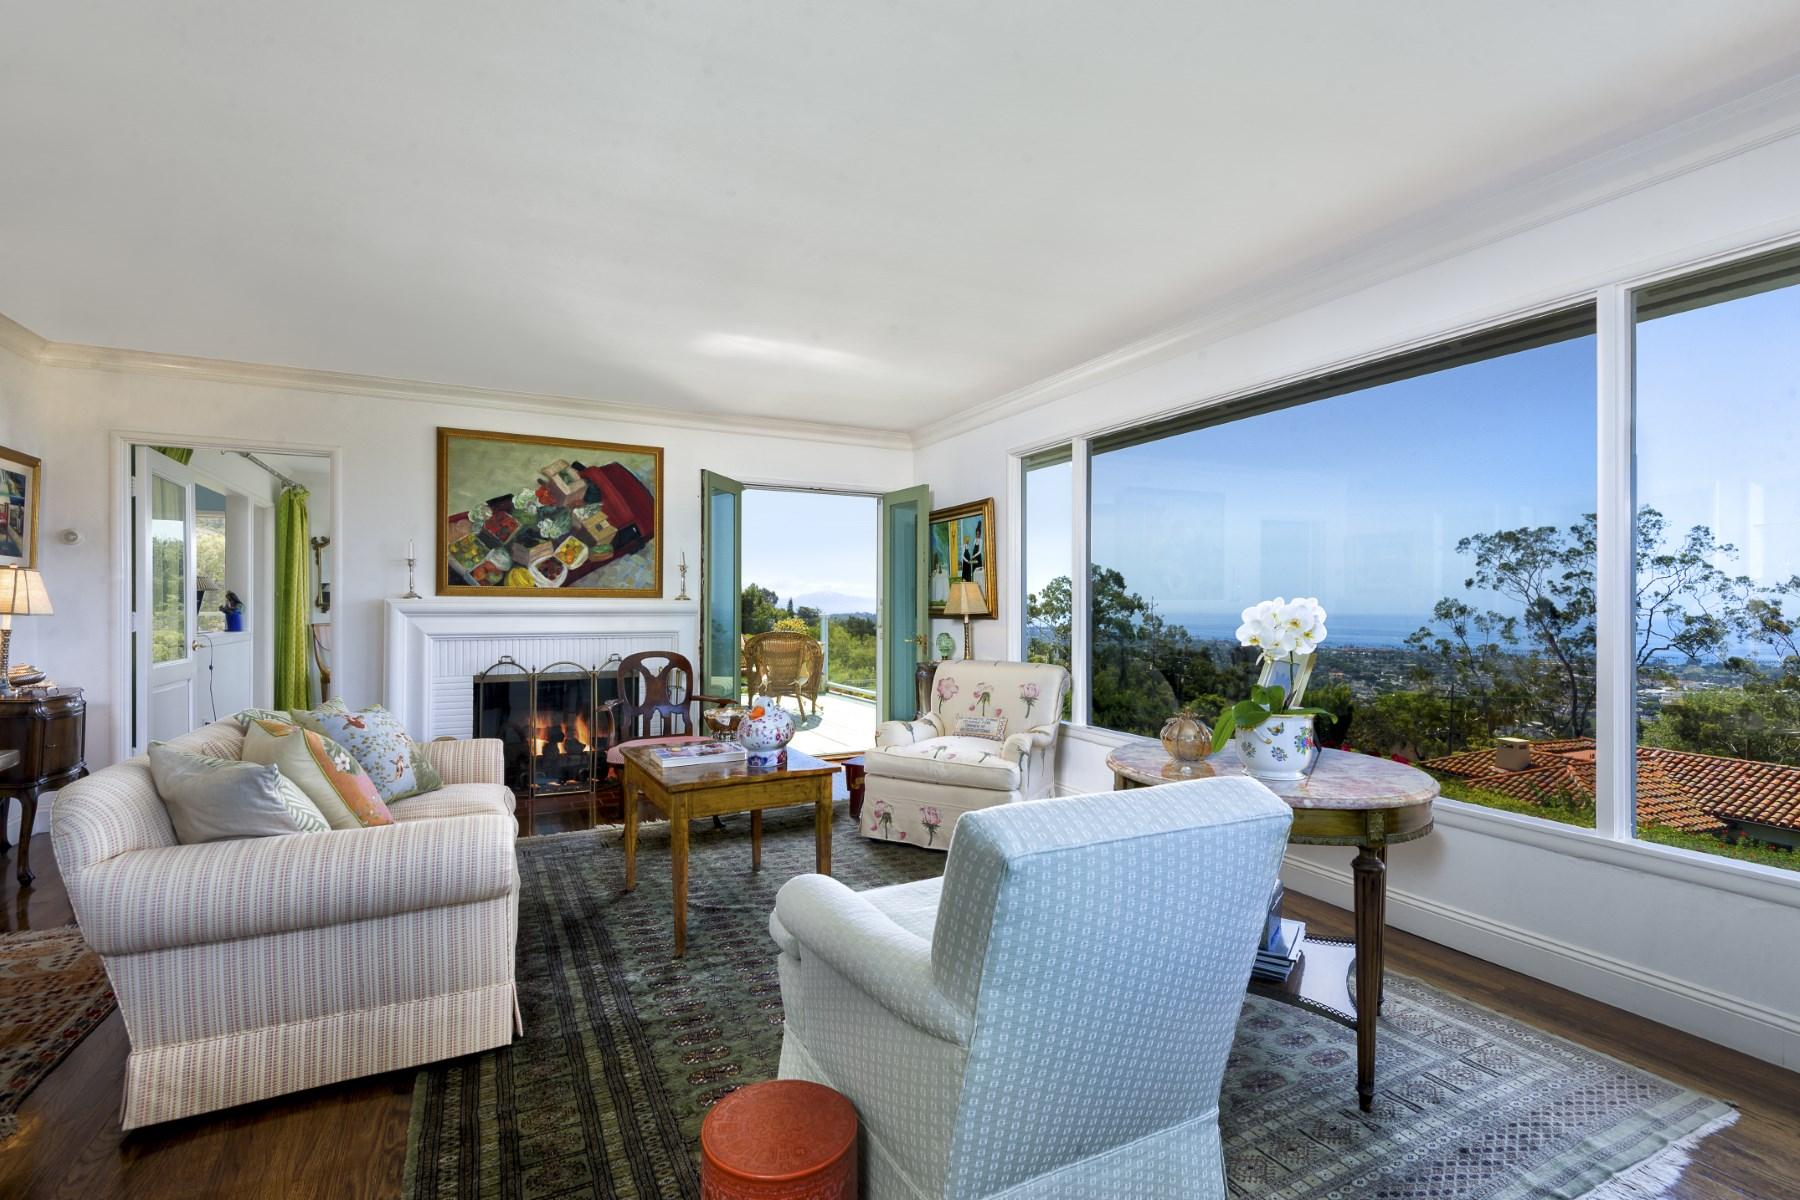 Single Family Home for Sale at Santa Barbara Riviera View Home 1601 Paterna Road Riviera, Santa Barbara, California, 93103 United States